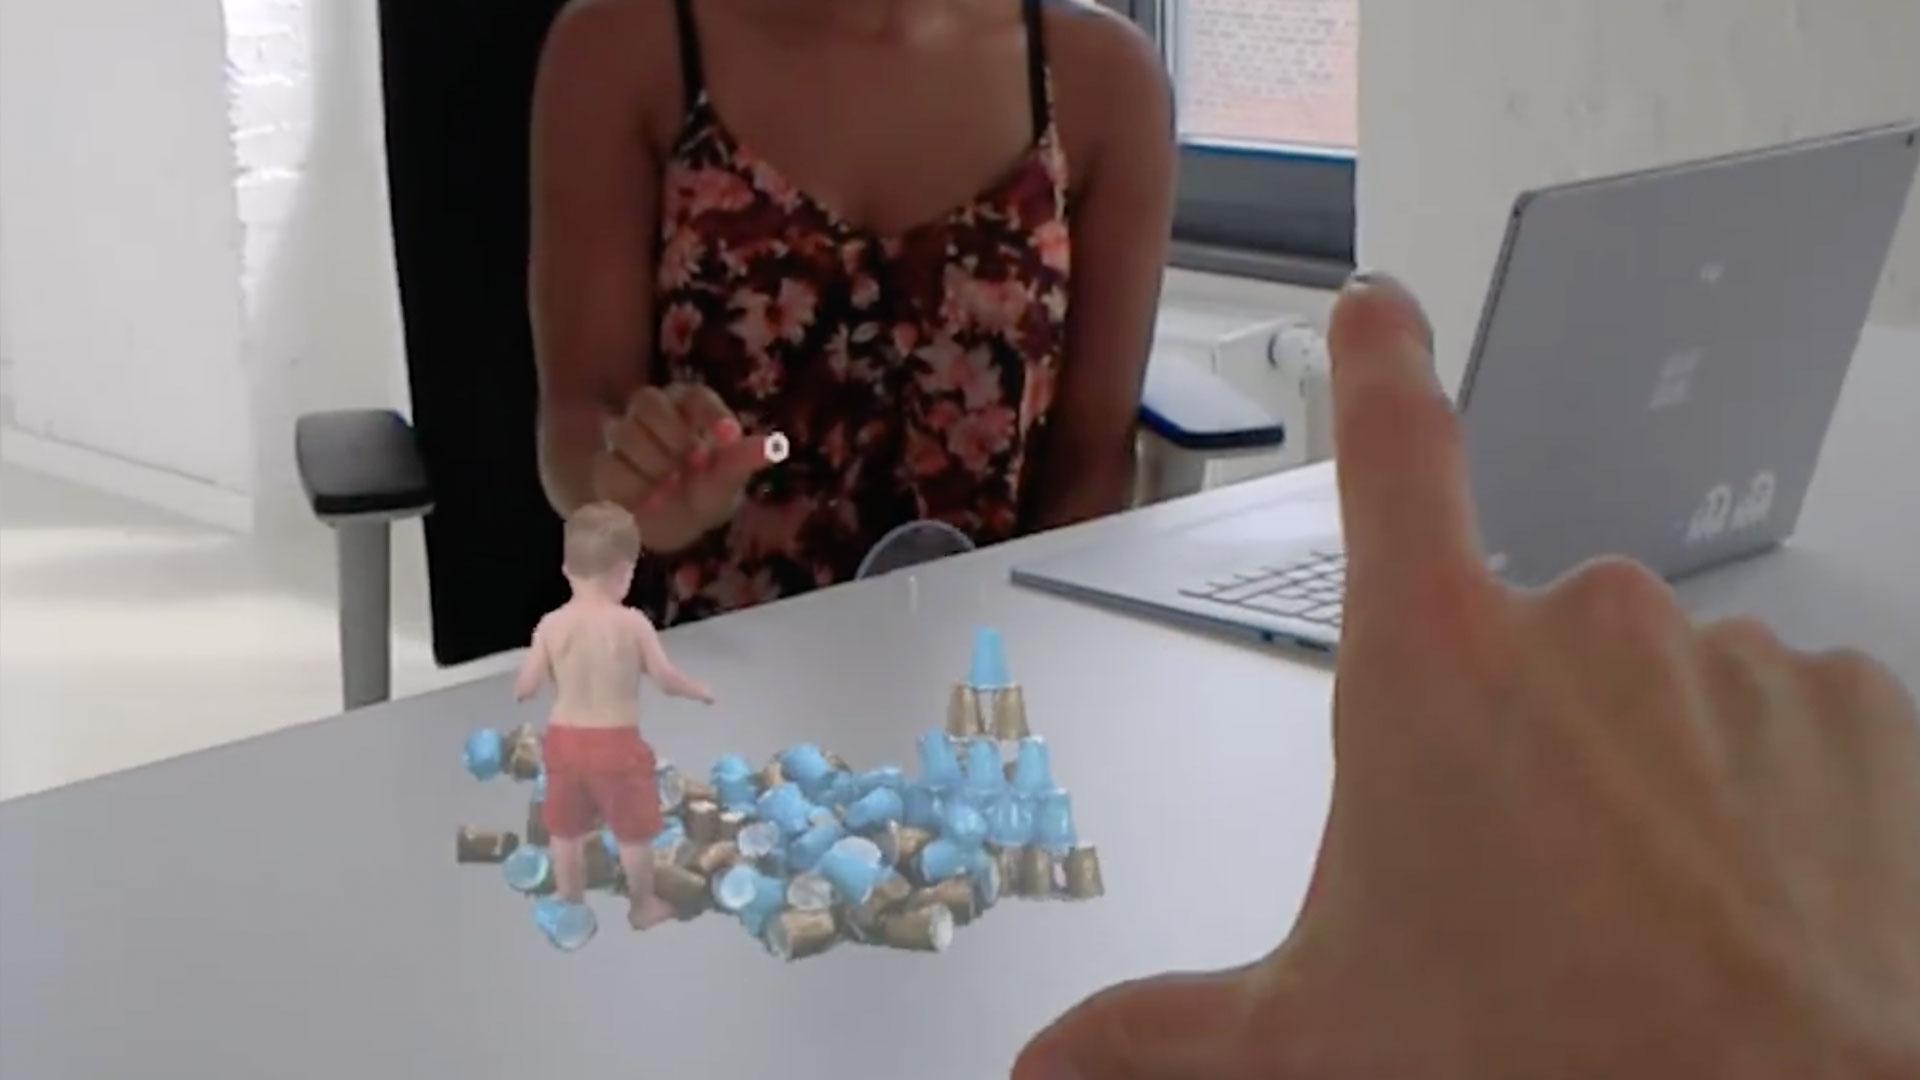 hololens – First Look (HoloLens)